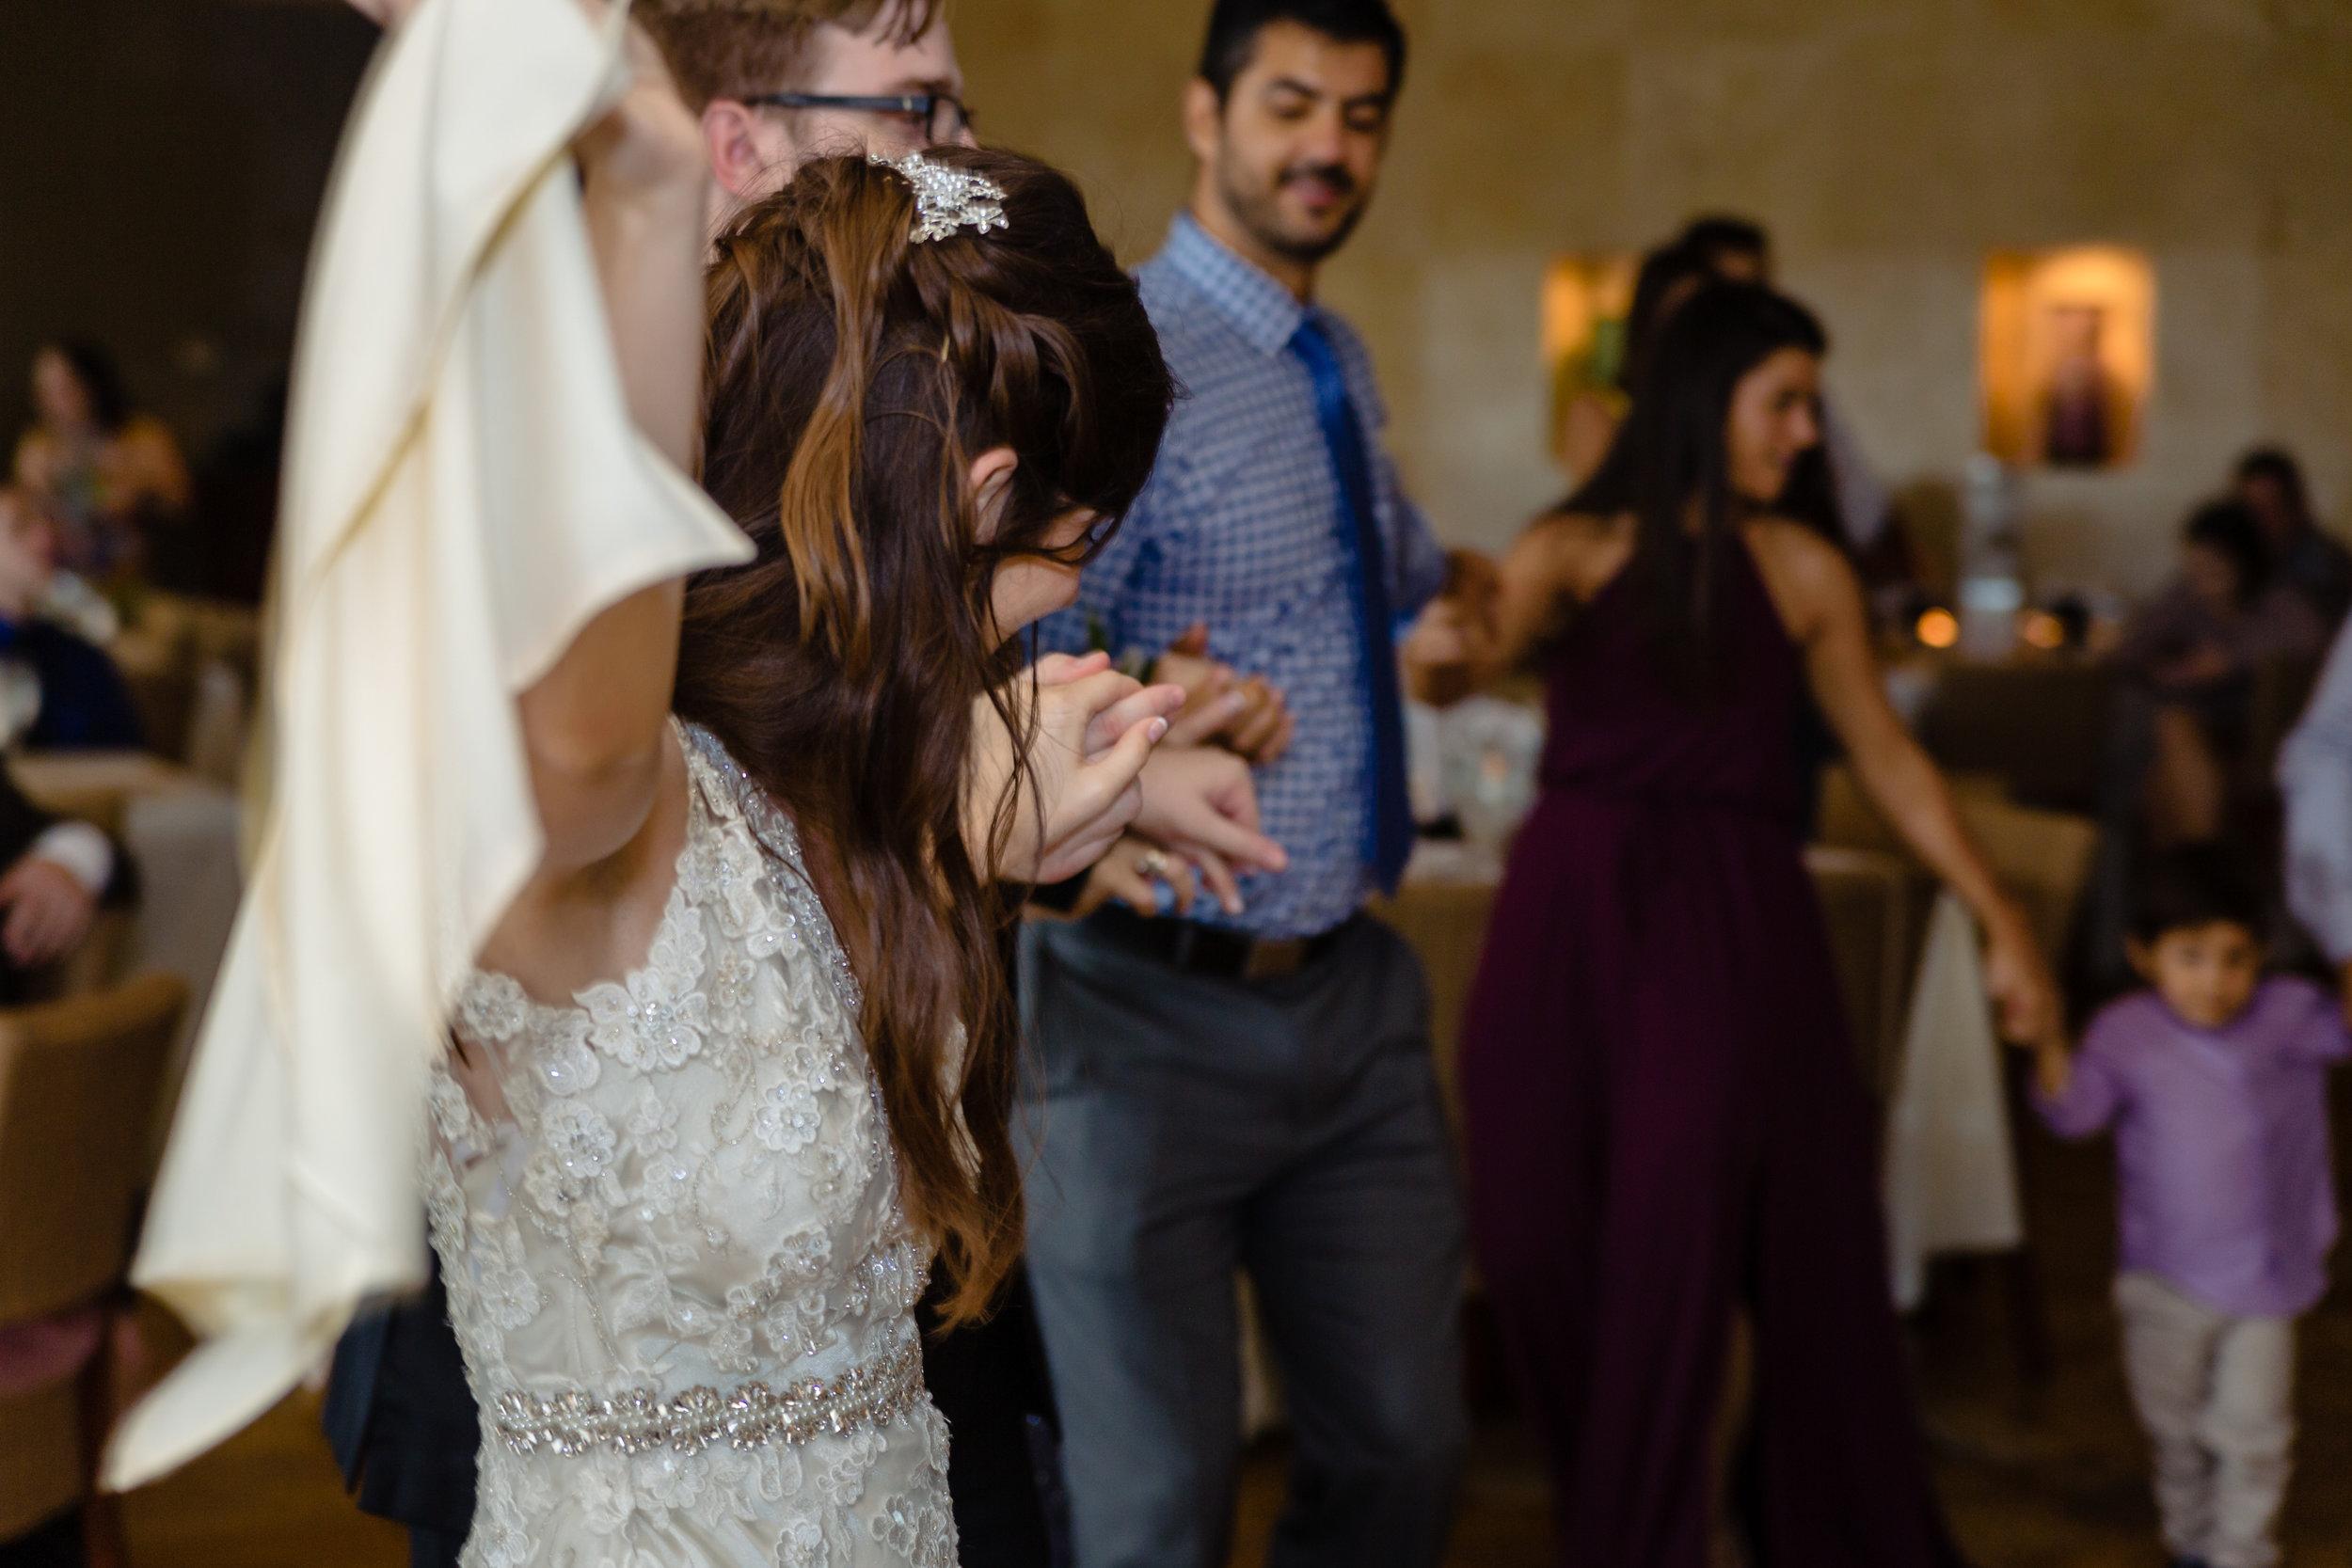 HAH_Zoe and Daniel_Clearwater Wedding_551_2018.jpg